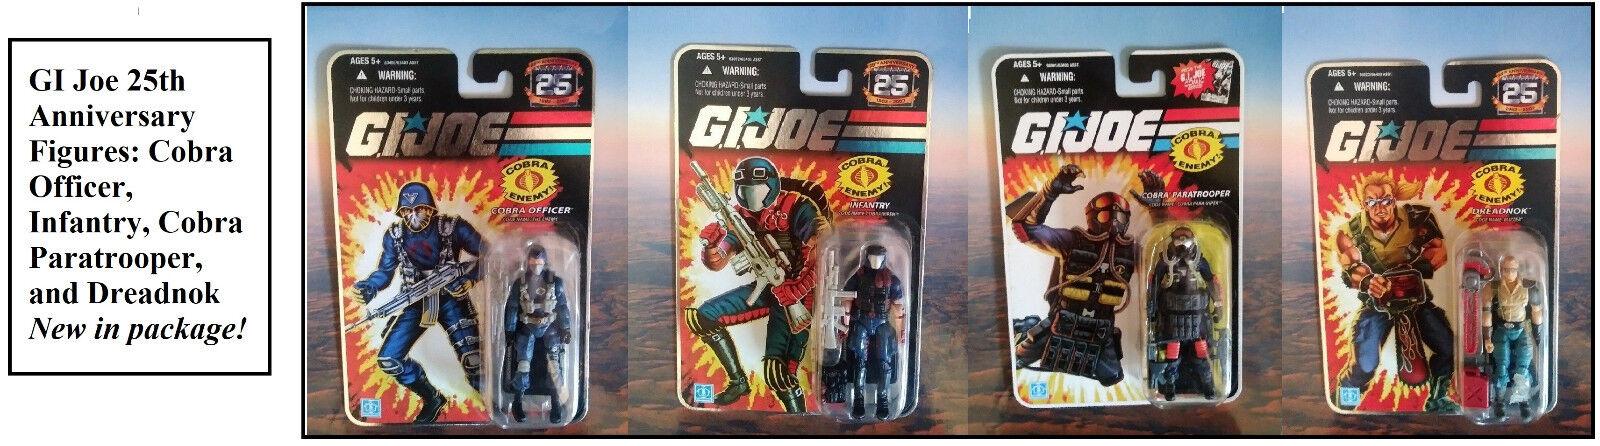 GI Joe Figure Set of 4 Cobra Officer, Infantry, Cobra  Paratrooper, Dreadnok nouveau  magnifique